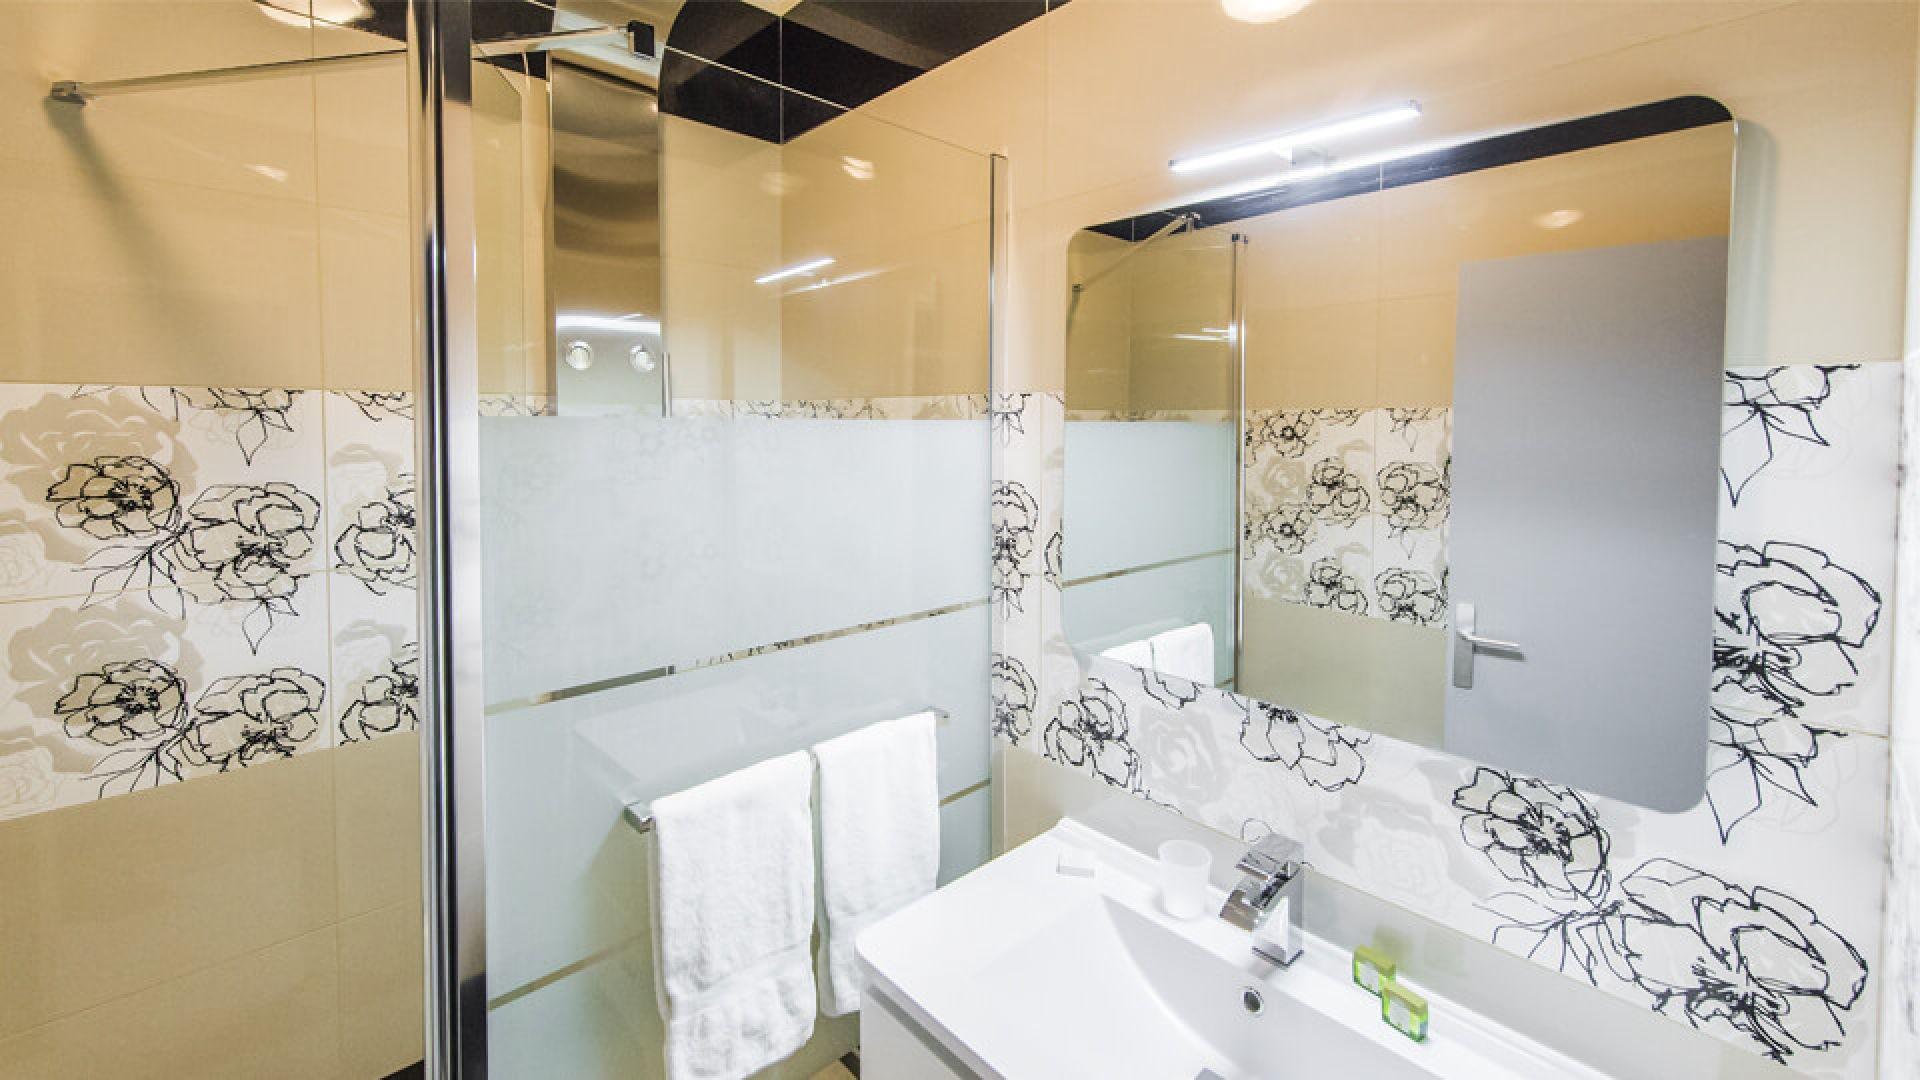 Salle de bains: quelle douche choisir (italienne, bac, cabine) ?